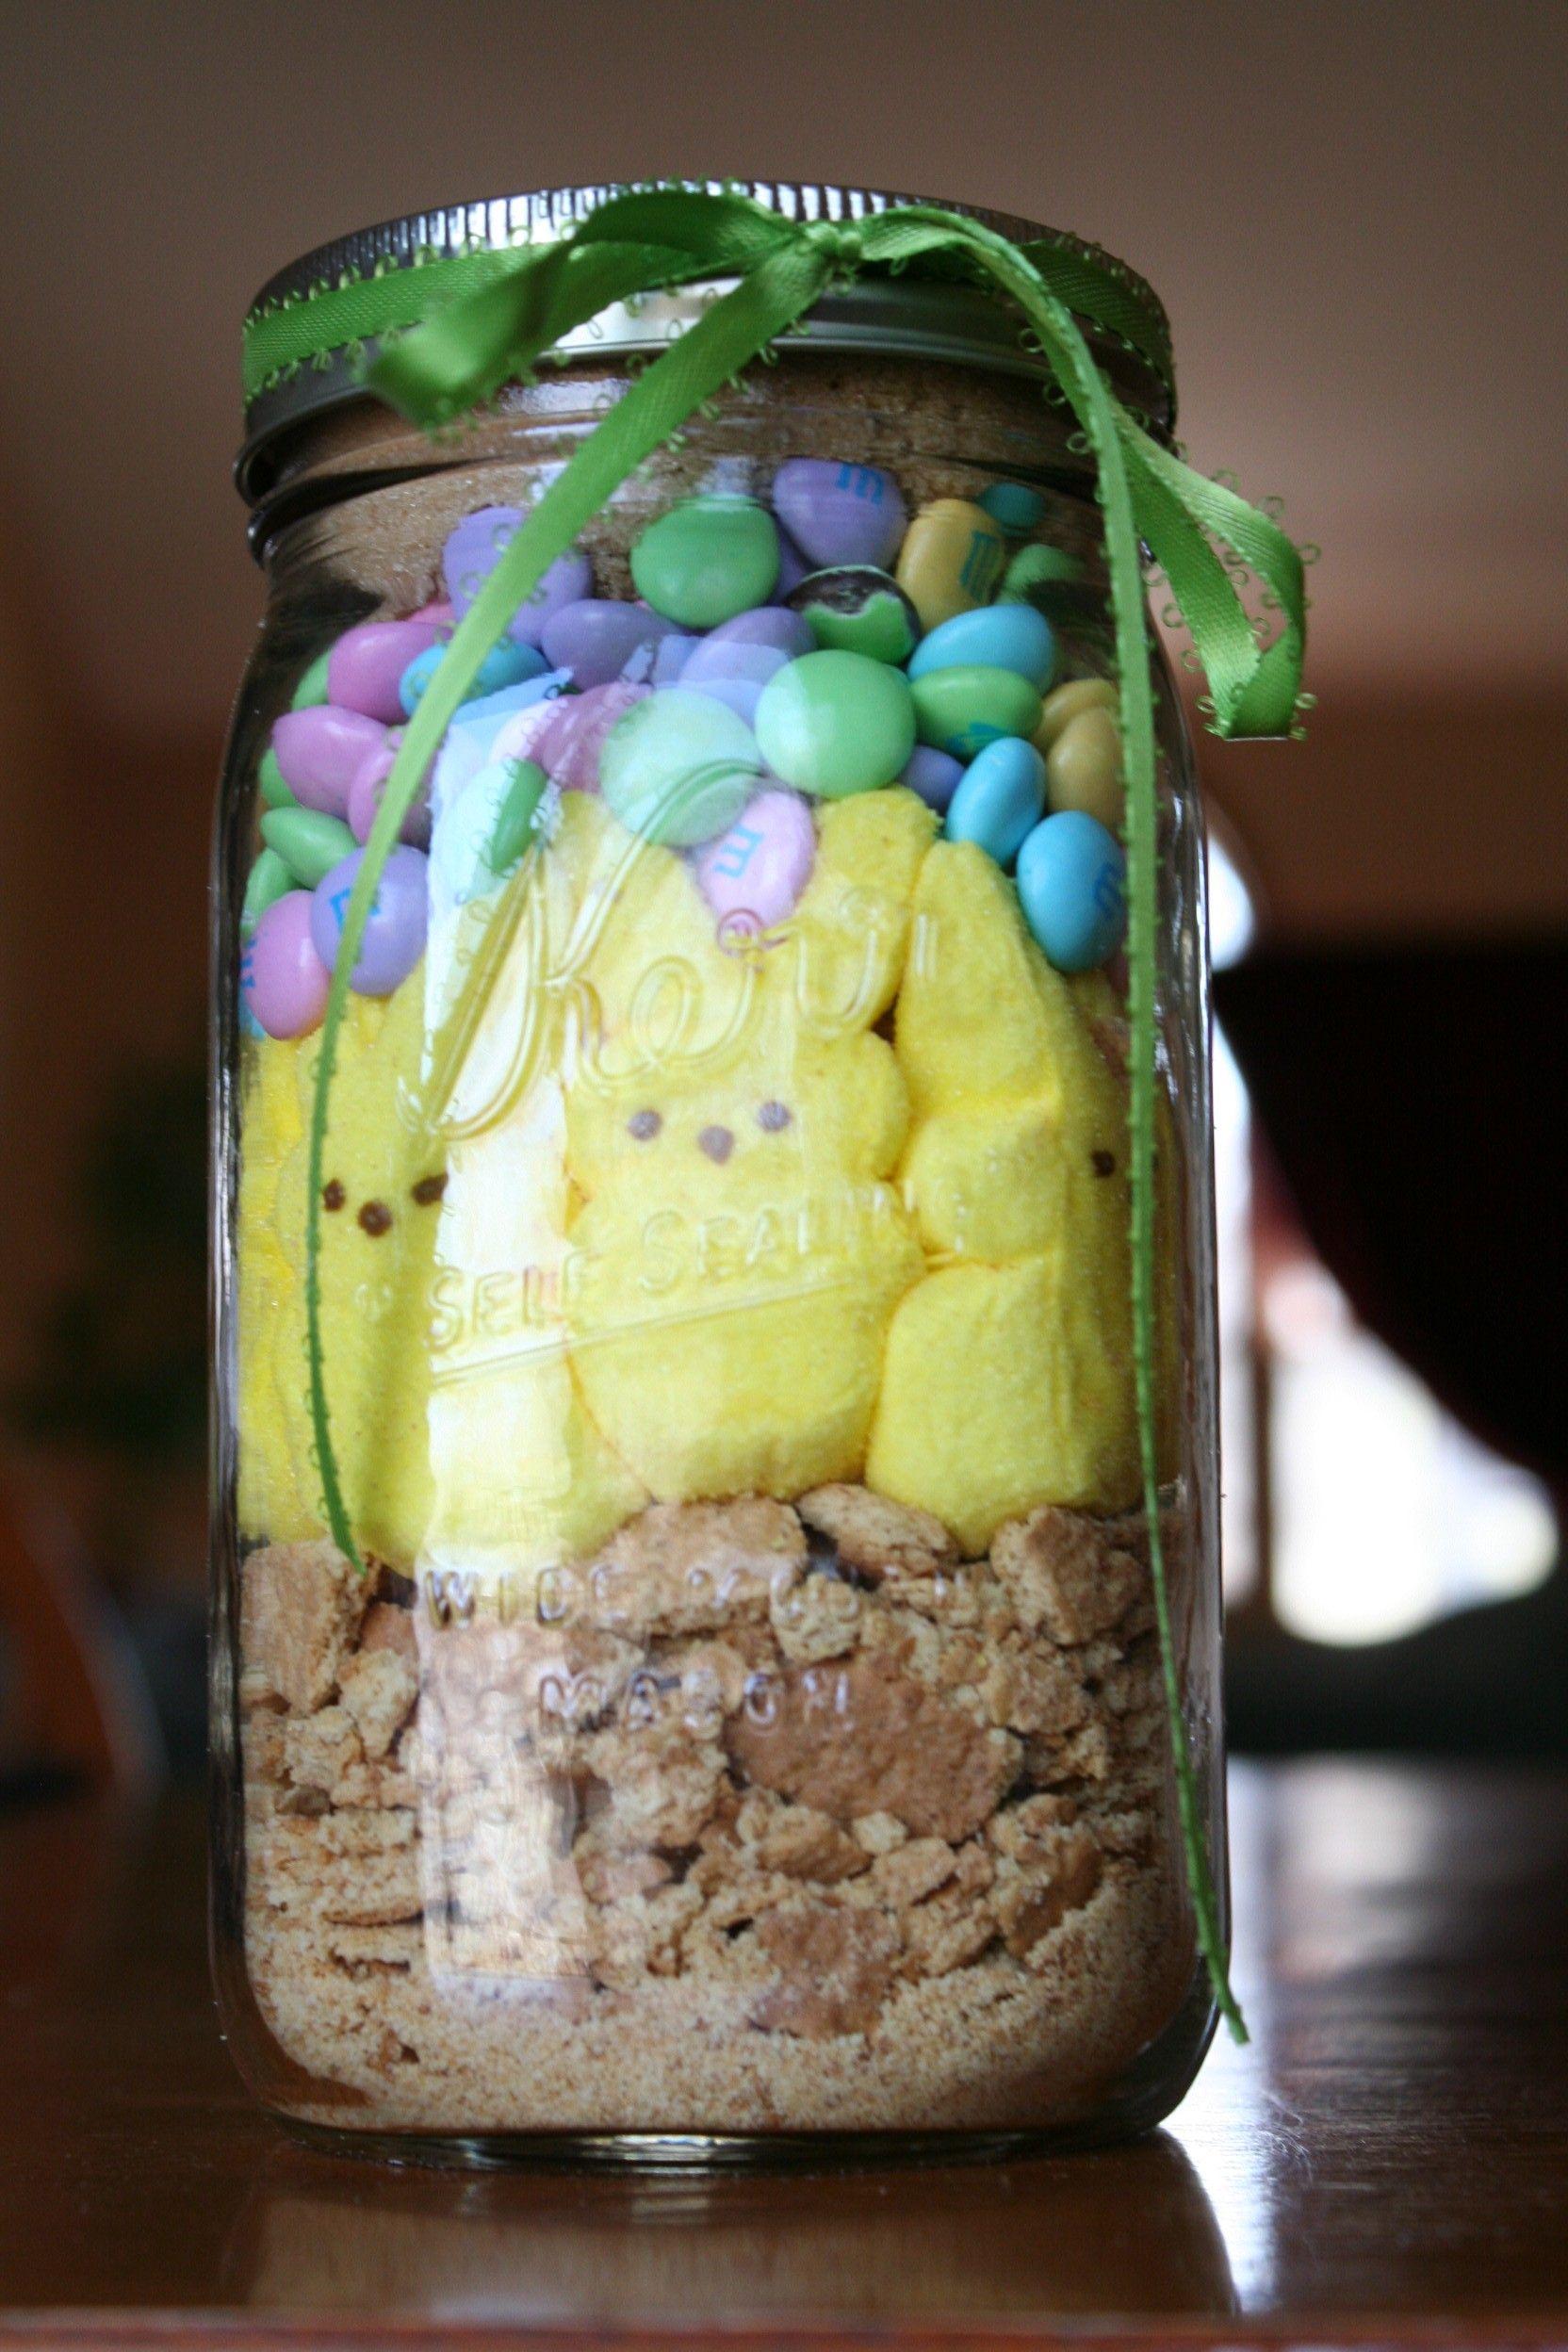 Creative easter gift ideas - Easter Mason Jar Inspiration Diy Easter Gift Ideas